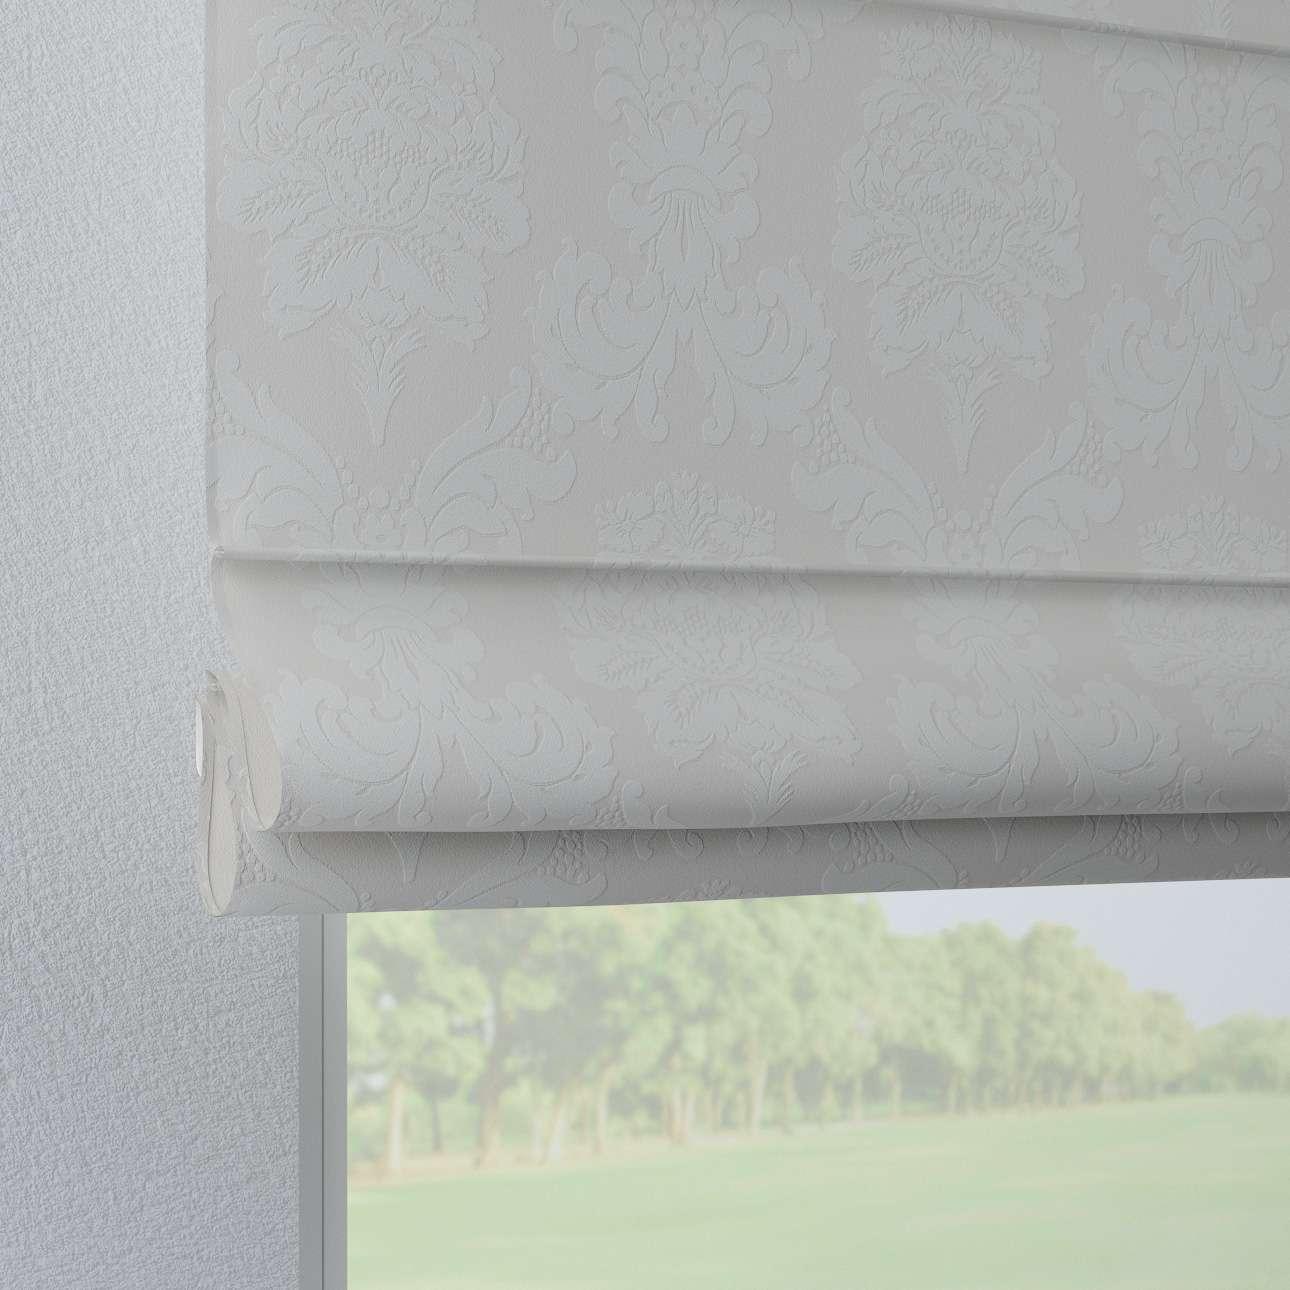 Verona tab top roman blind 80 x 170 cm (31.5 x 67 inch) in collection Damasco, fabric: 613-81